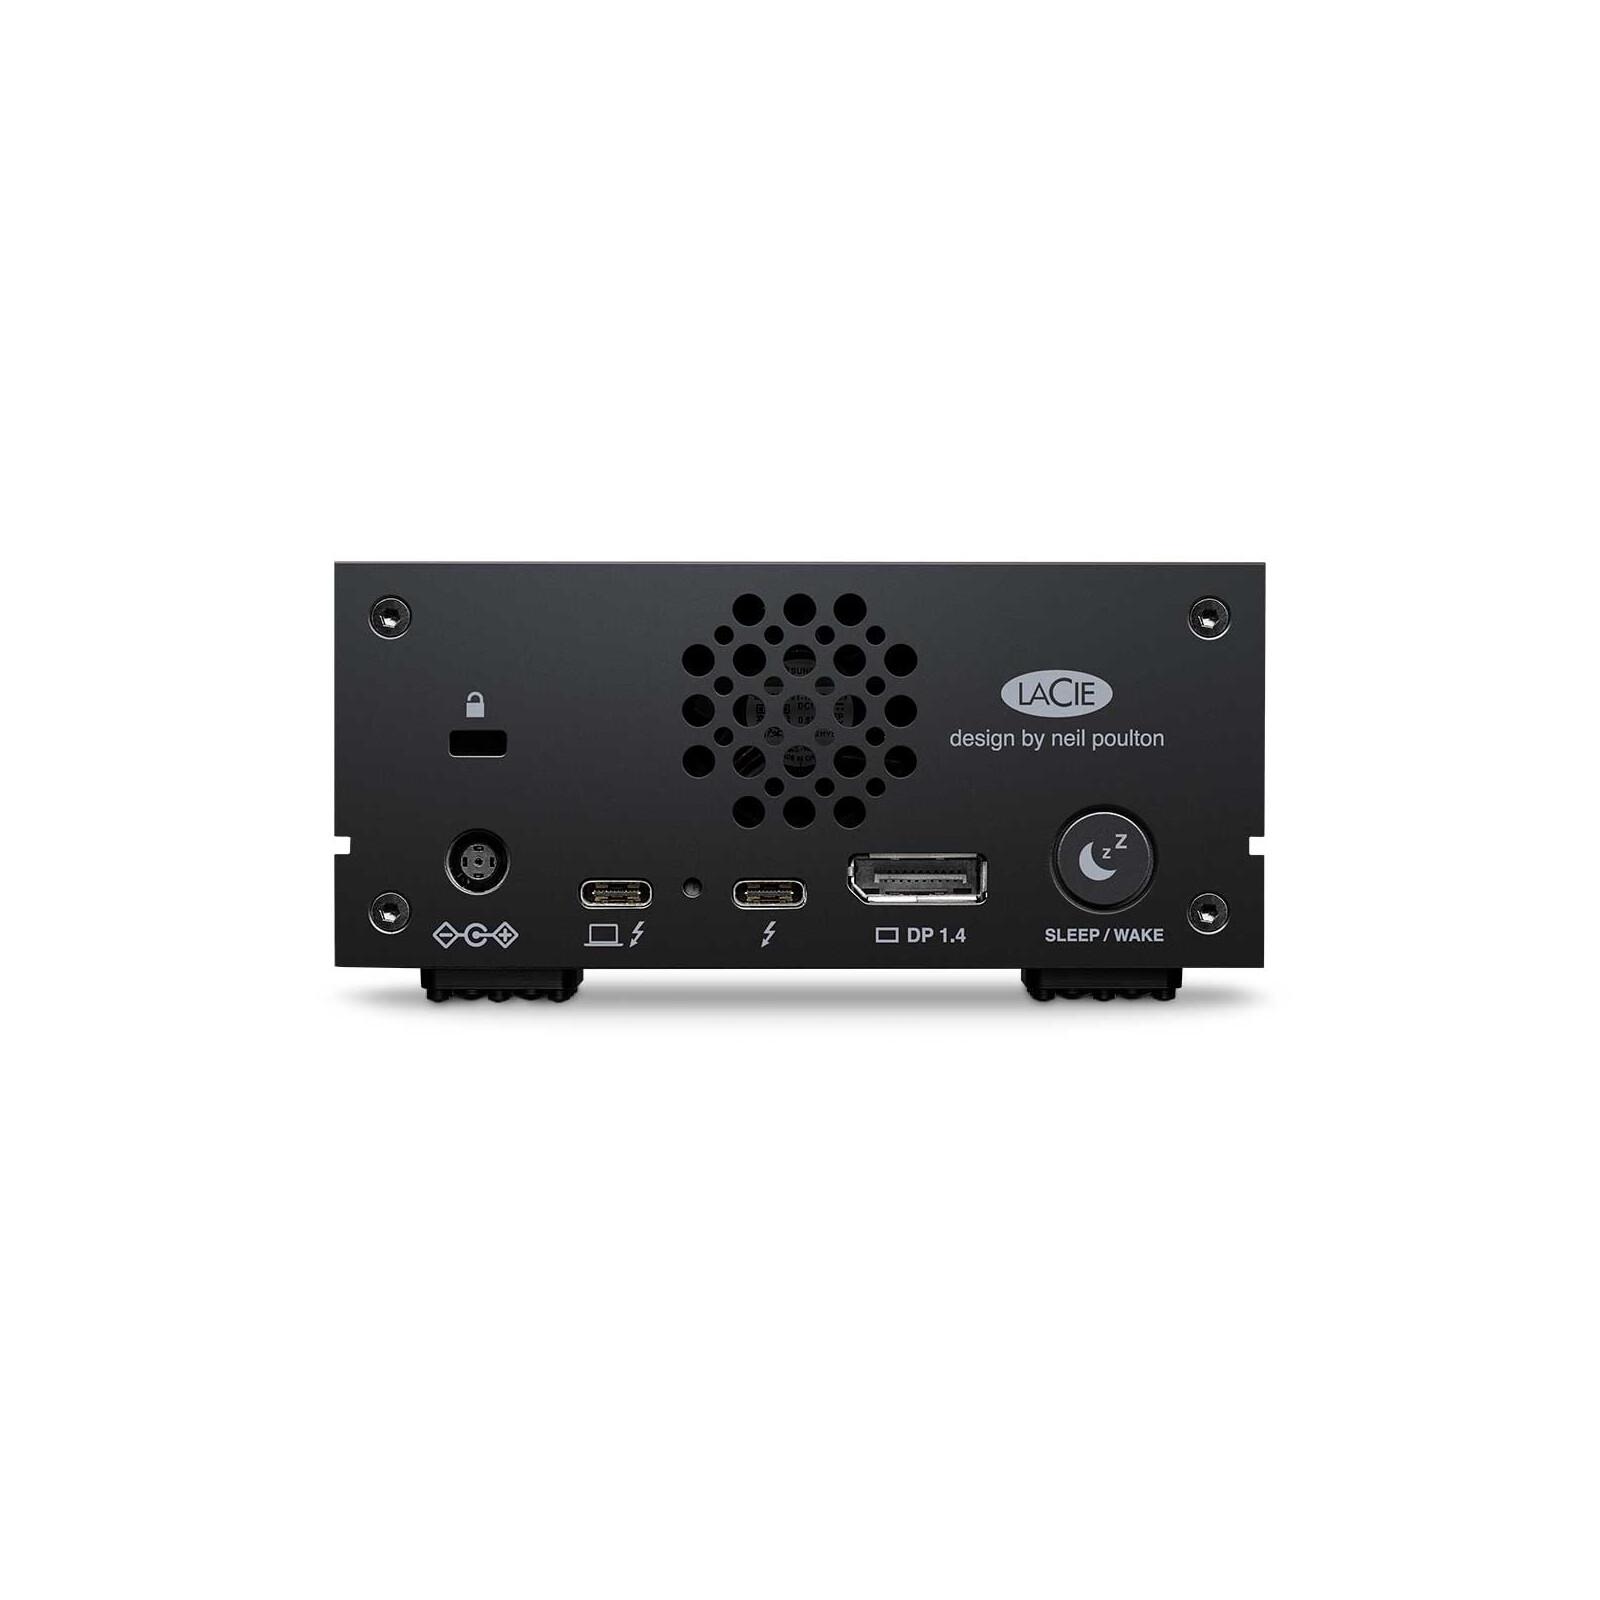 LaCie 1big Dock 16TB DAS Thunderbolt 3, USB-Hub, CF/SD, DP